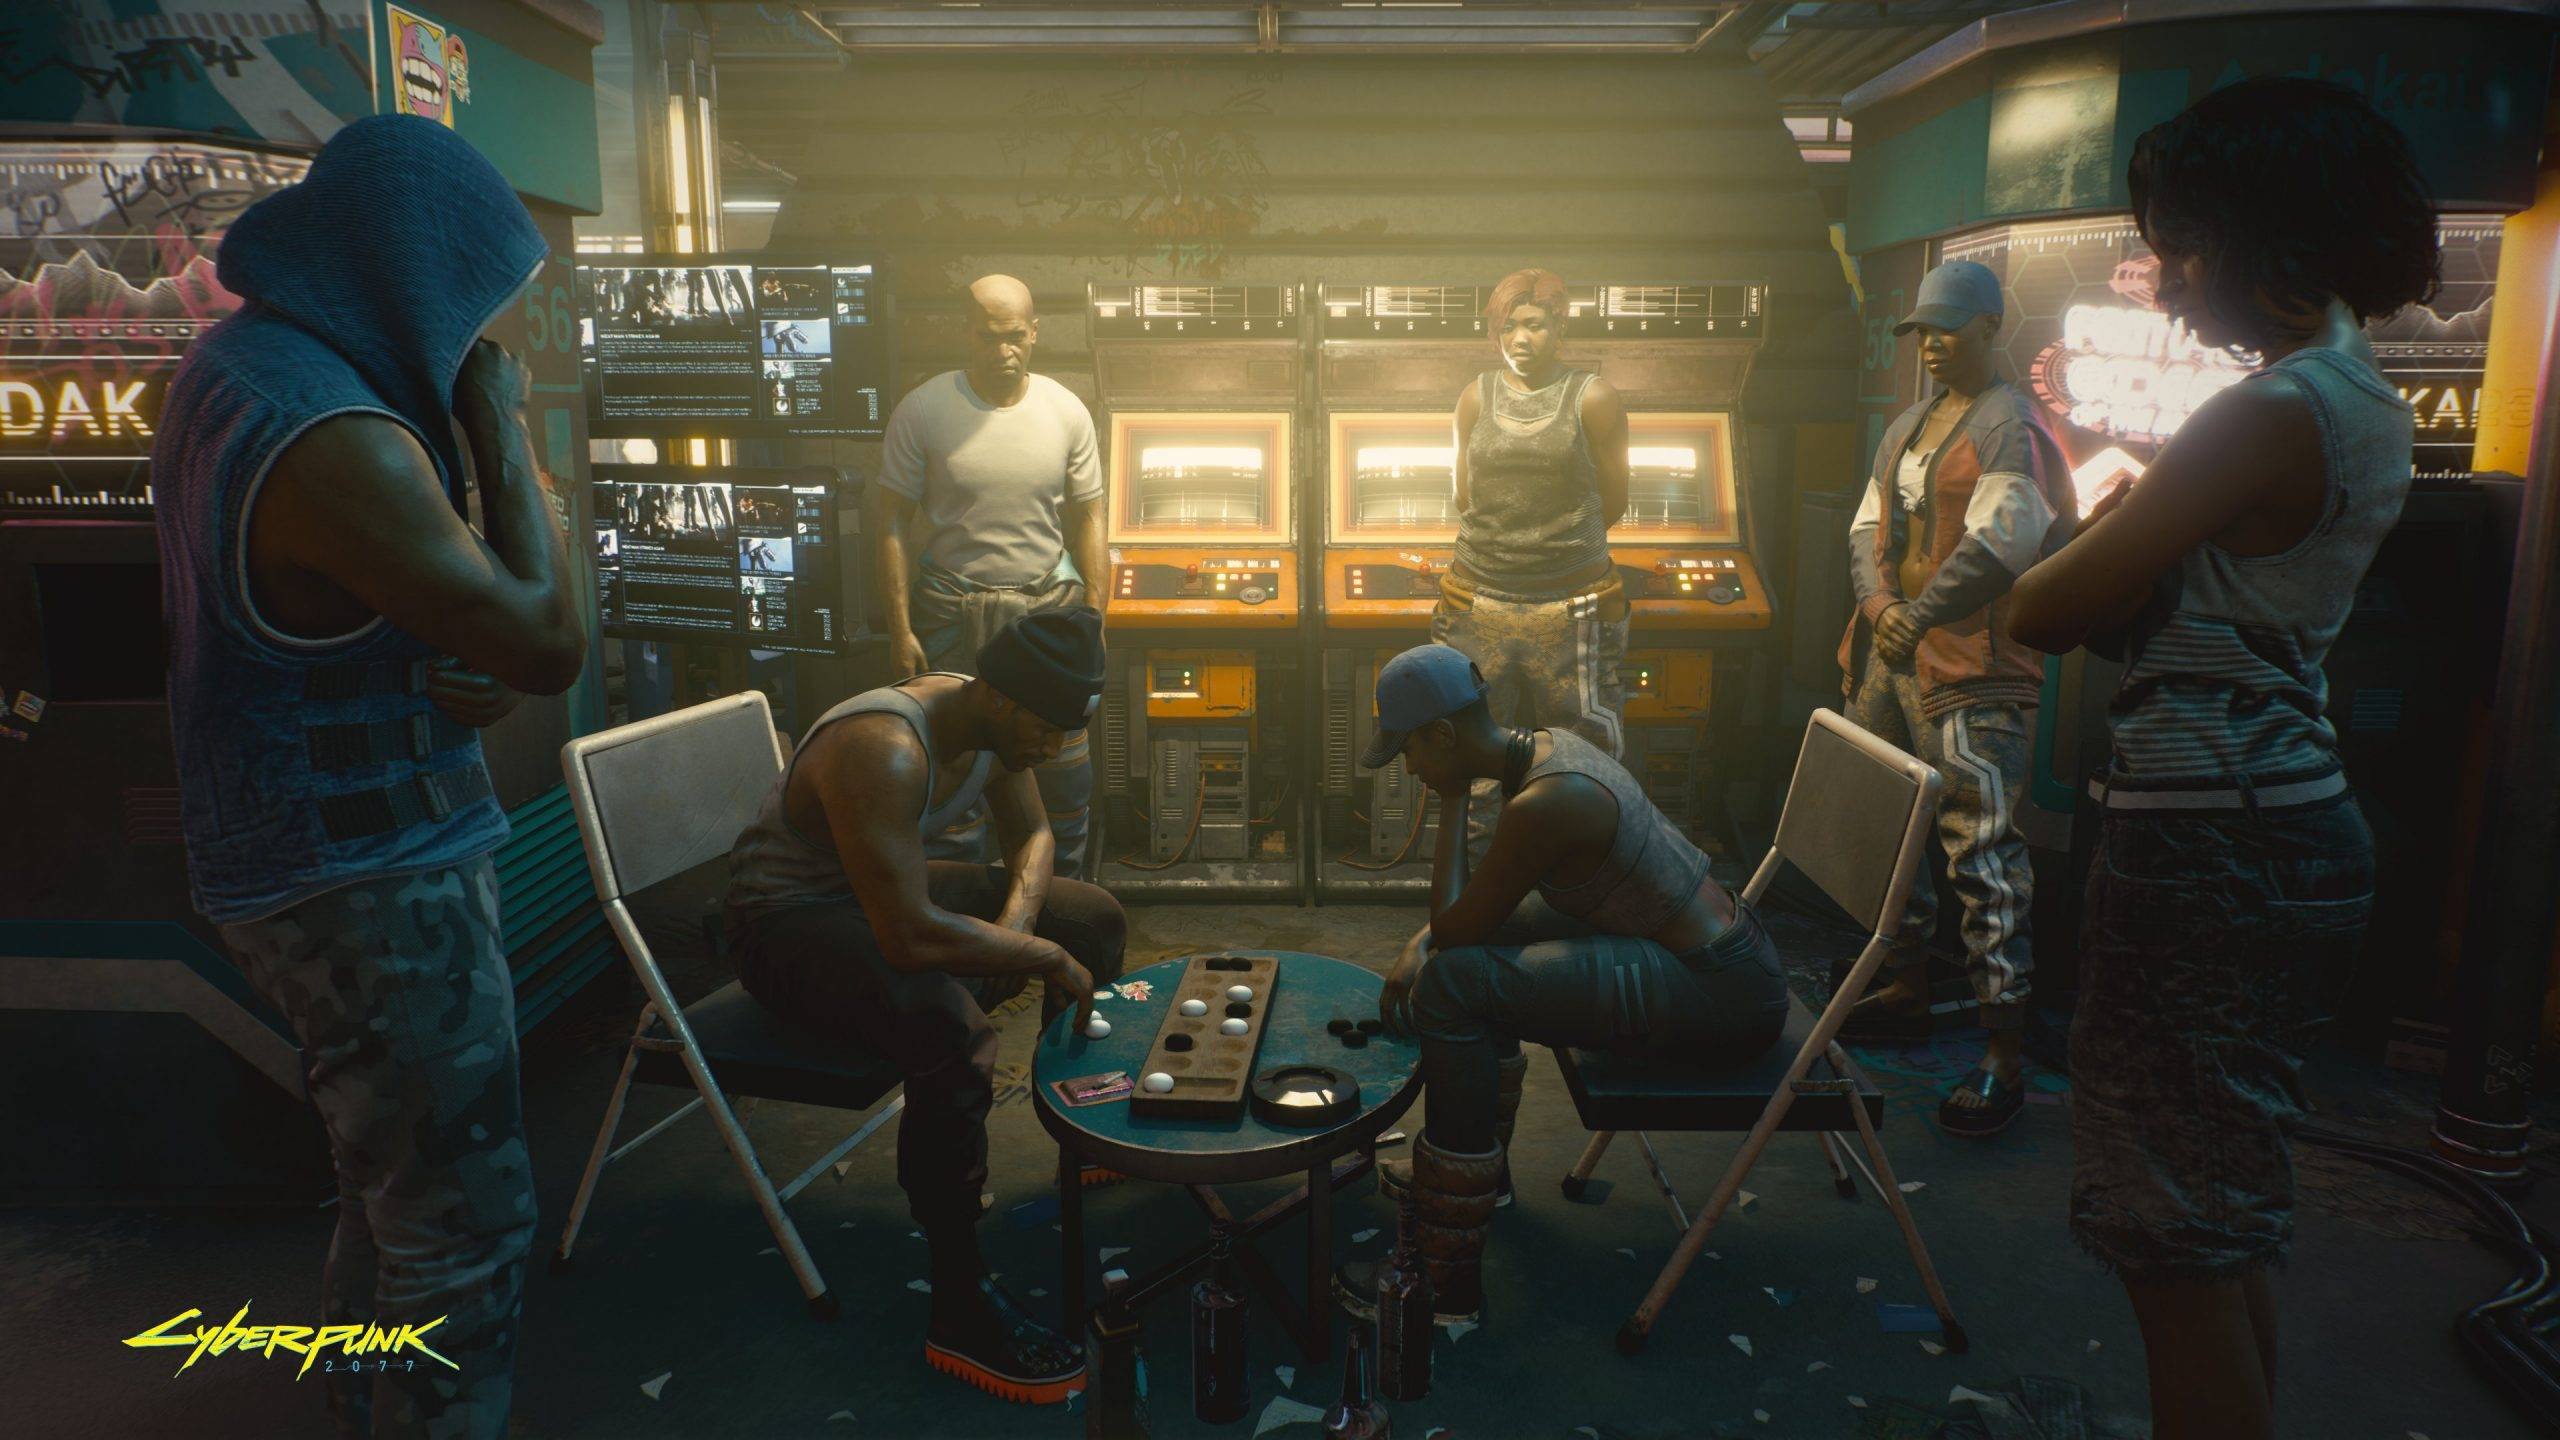 CD Projekt Red показала новые скриншоты из Cyberpunk 2077